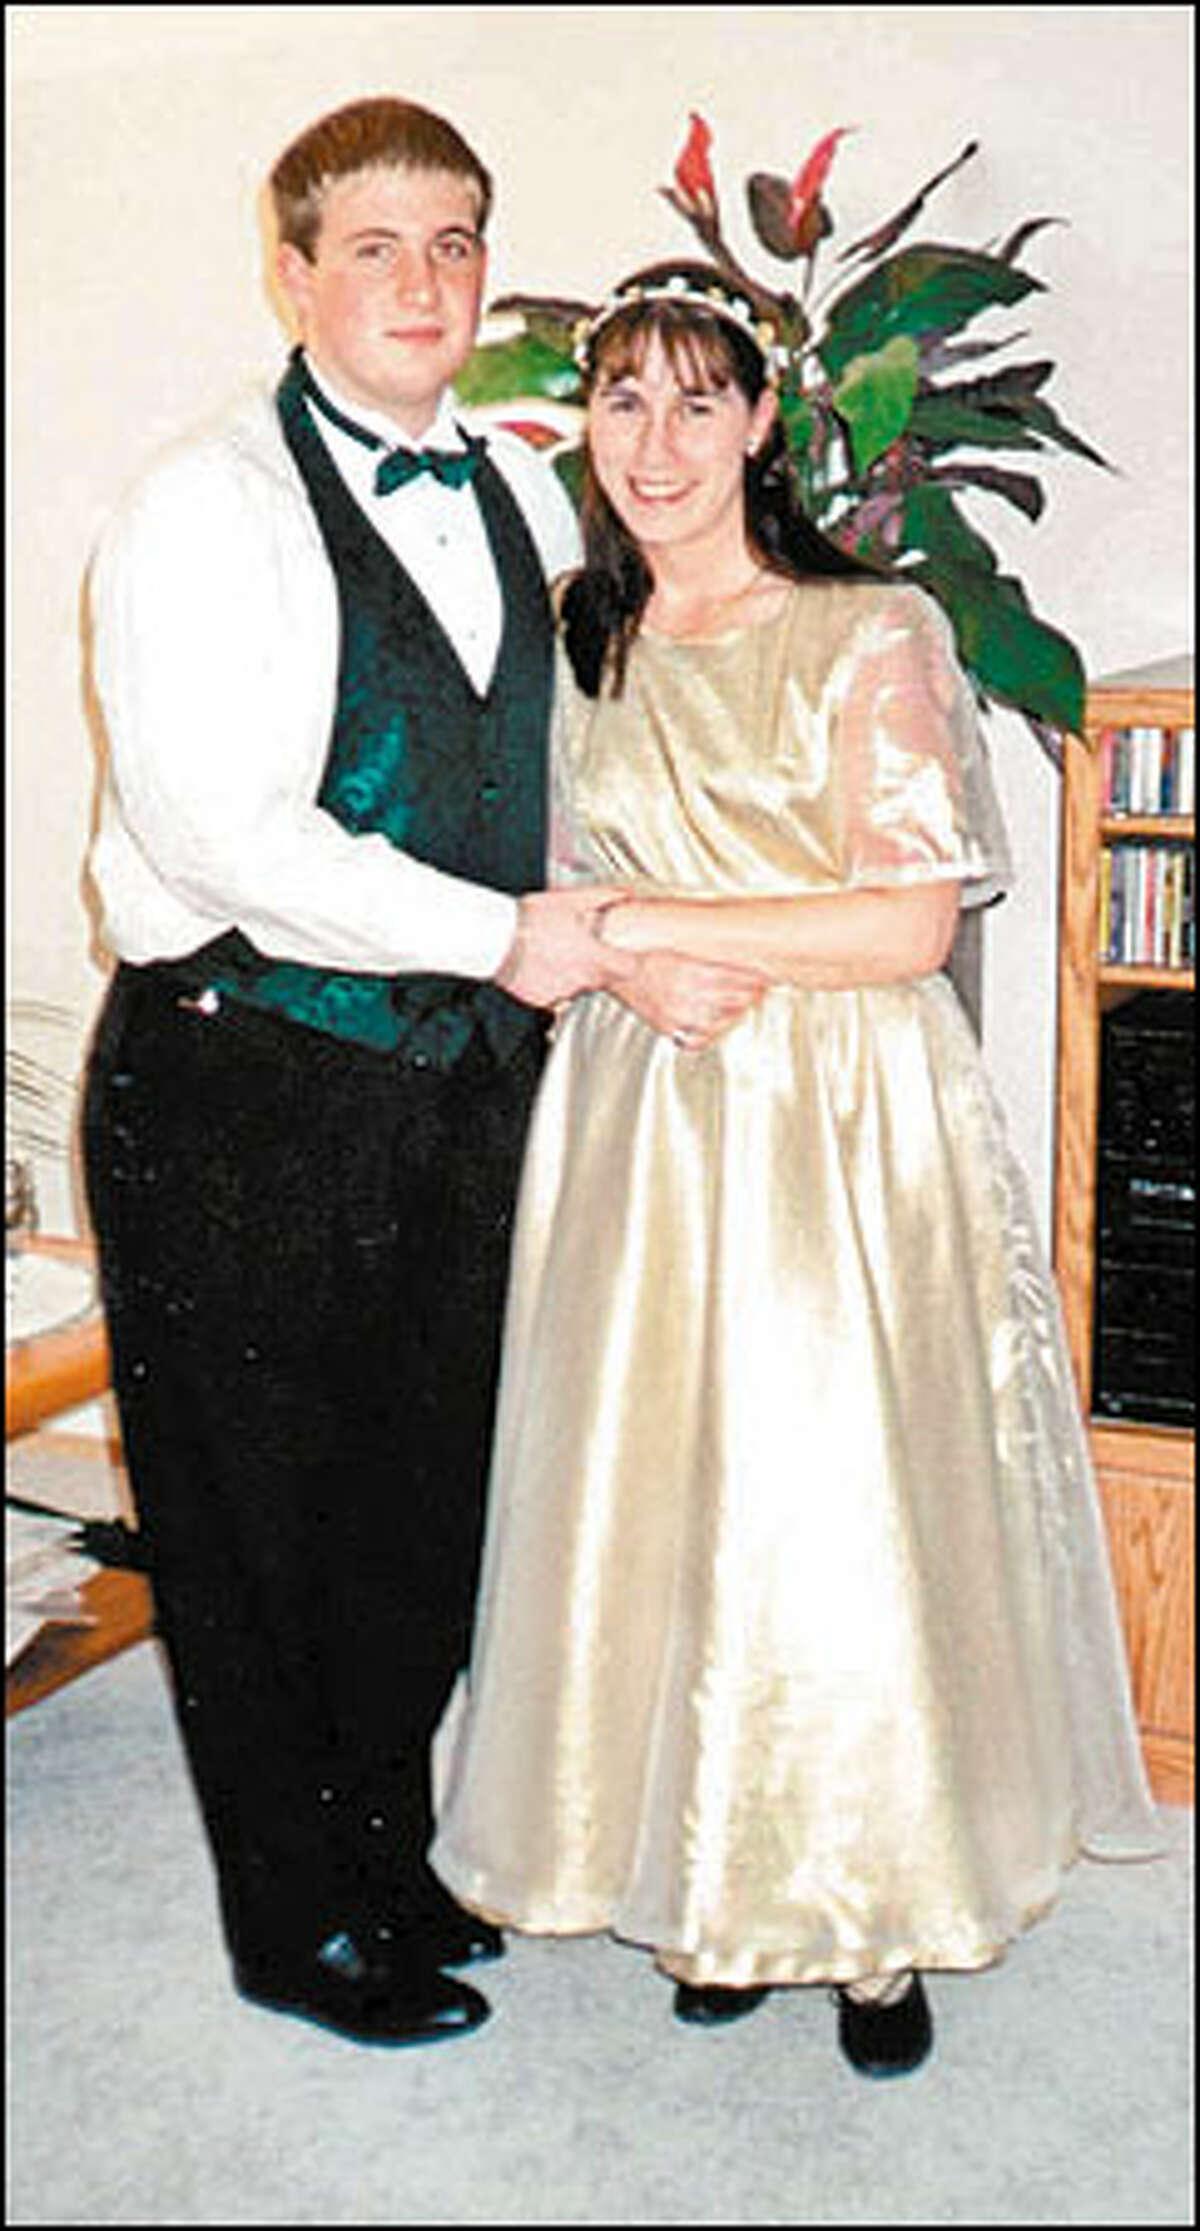 Treva Throneberry, alias Brianna Stewart, poses with a prom date.